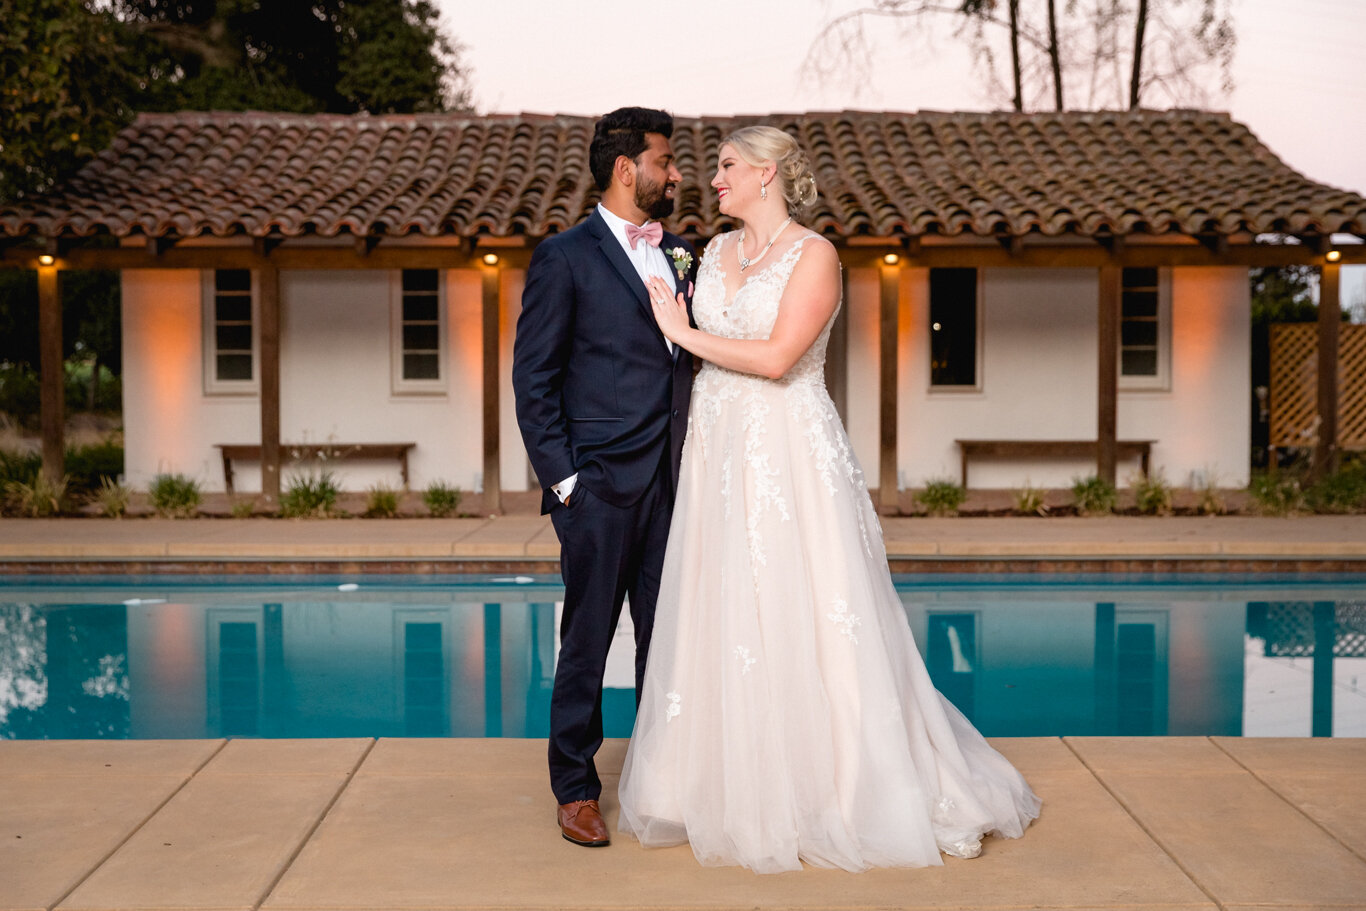 2019.08.24_Emily-Ashir-Wedding-at-the-Maples-6367.jpg